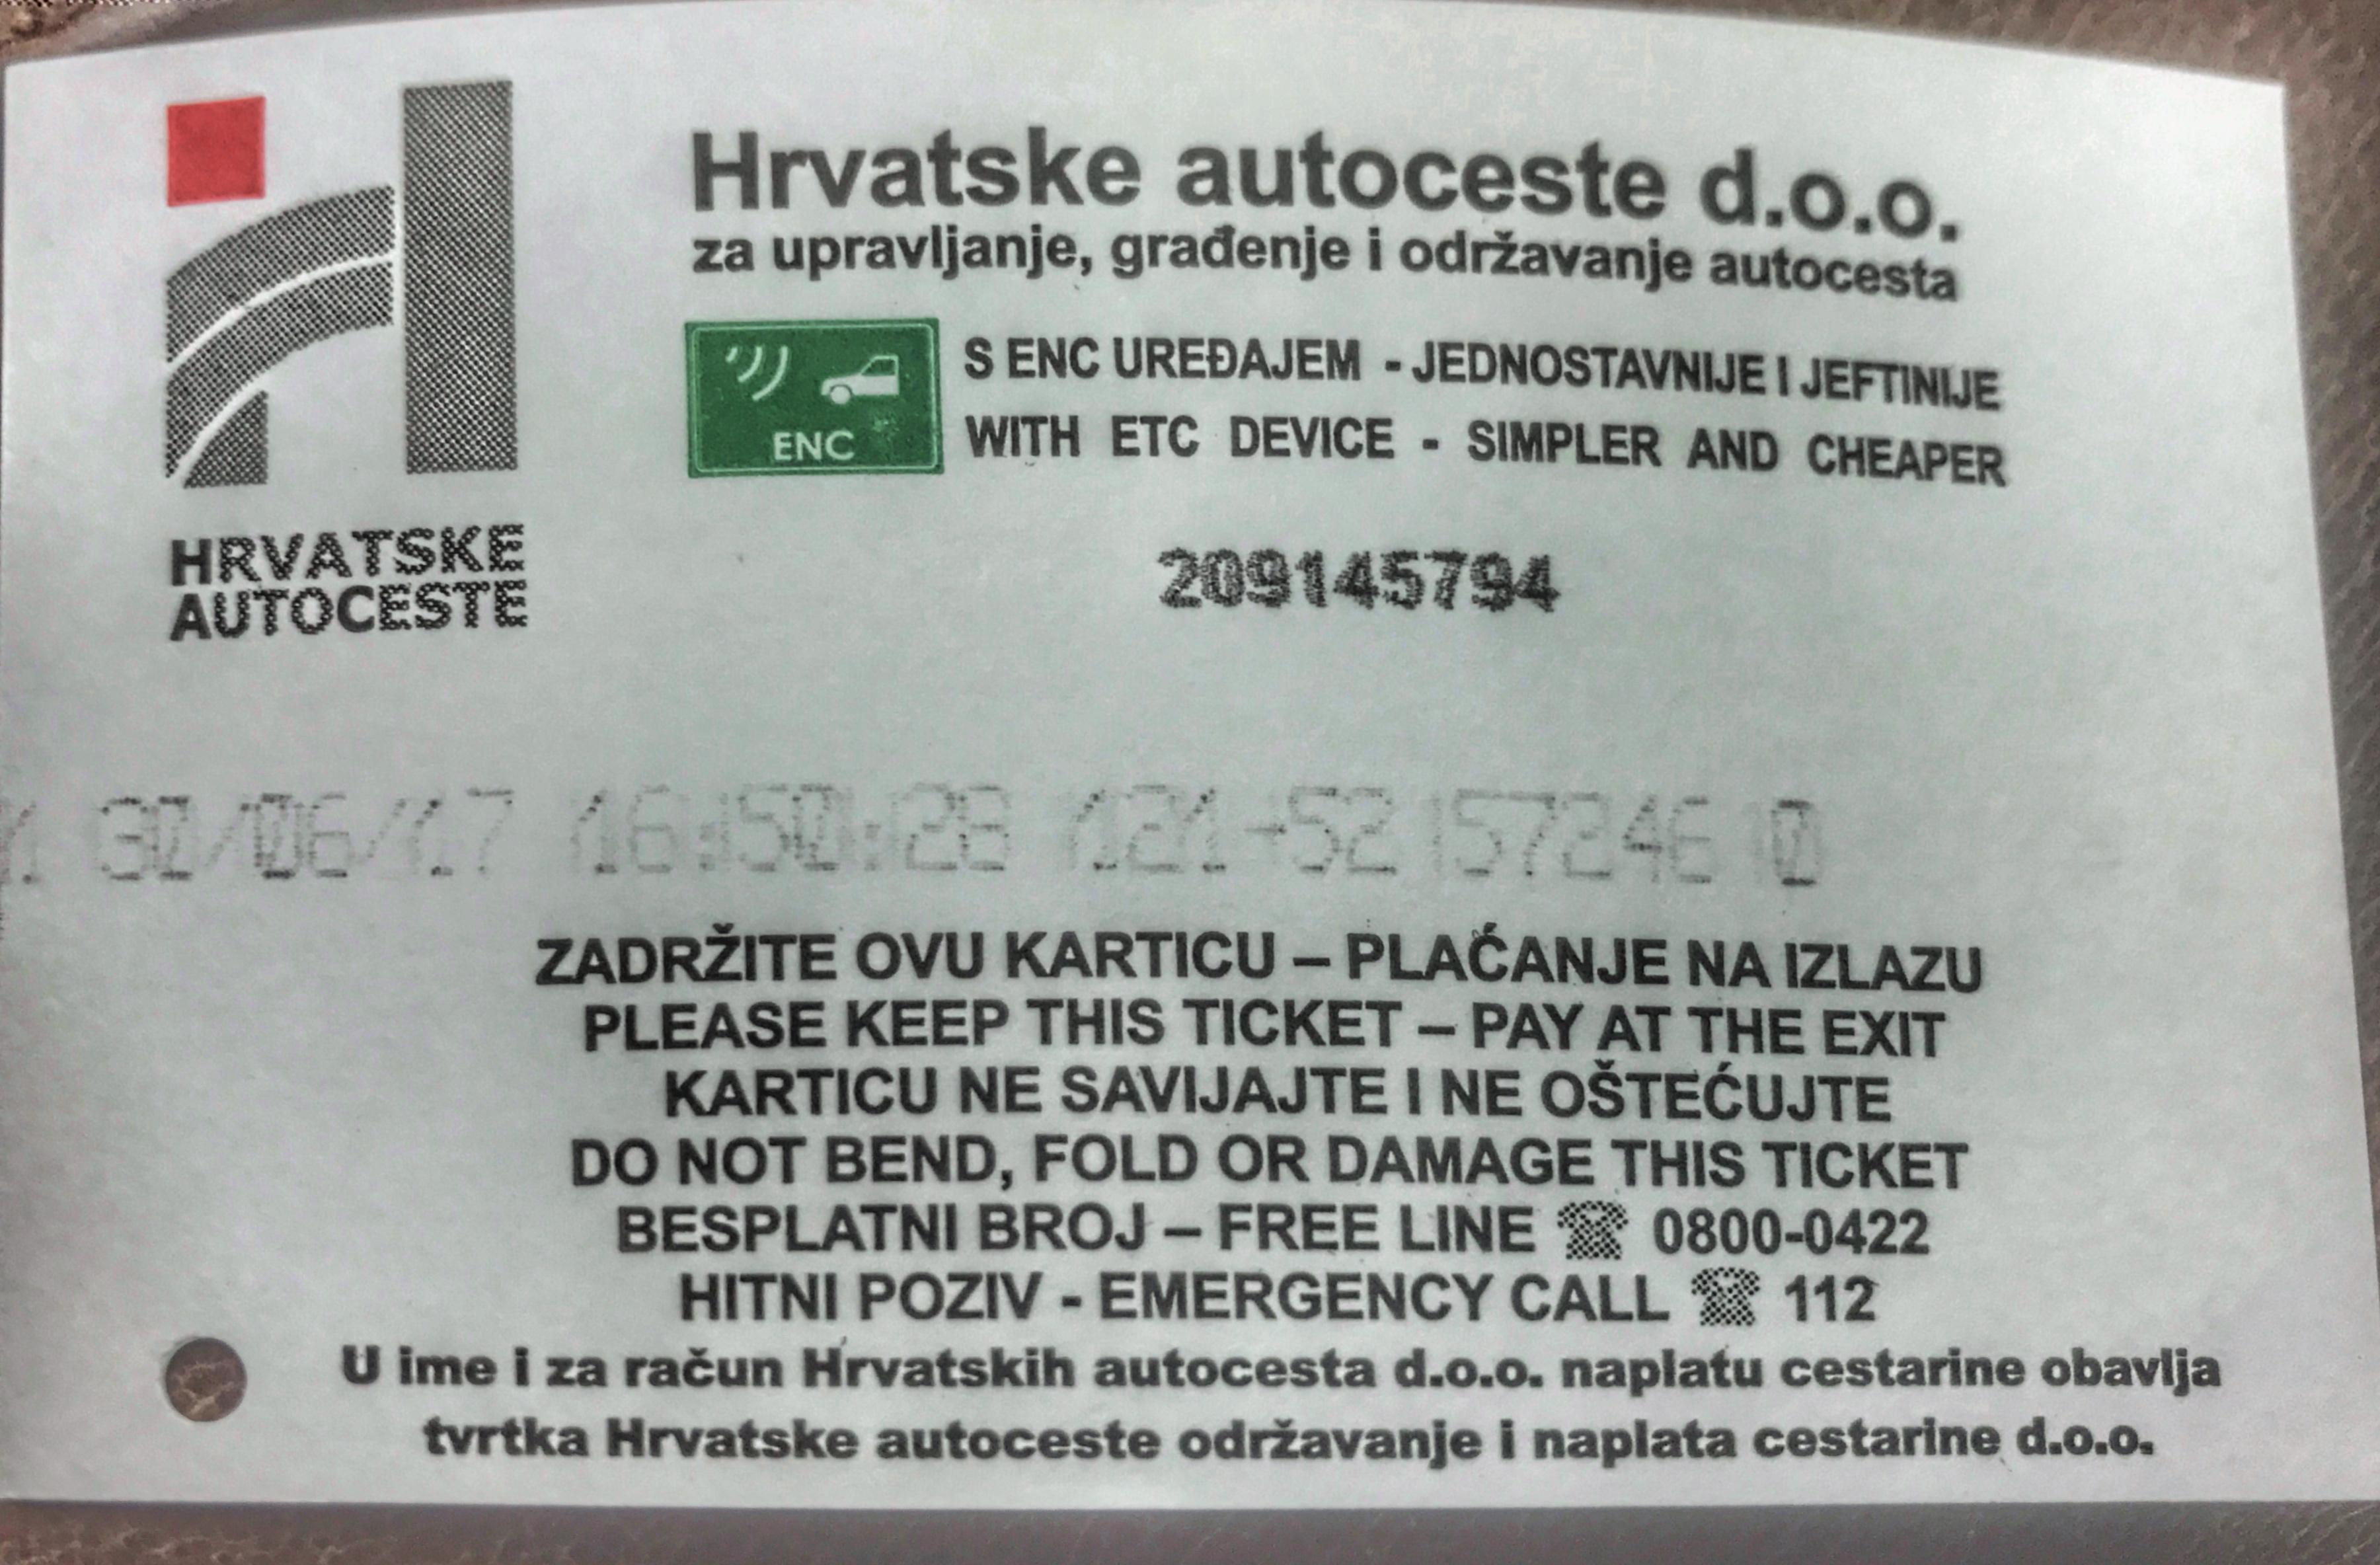 Driving in Croatia - motorway toll ticket